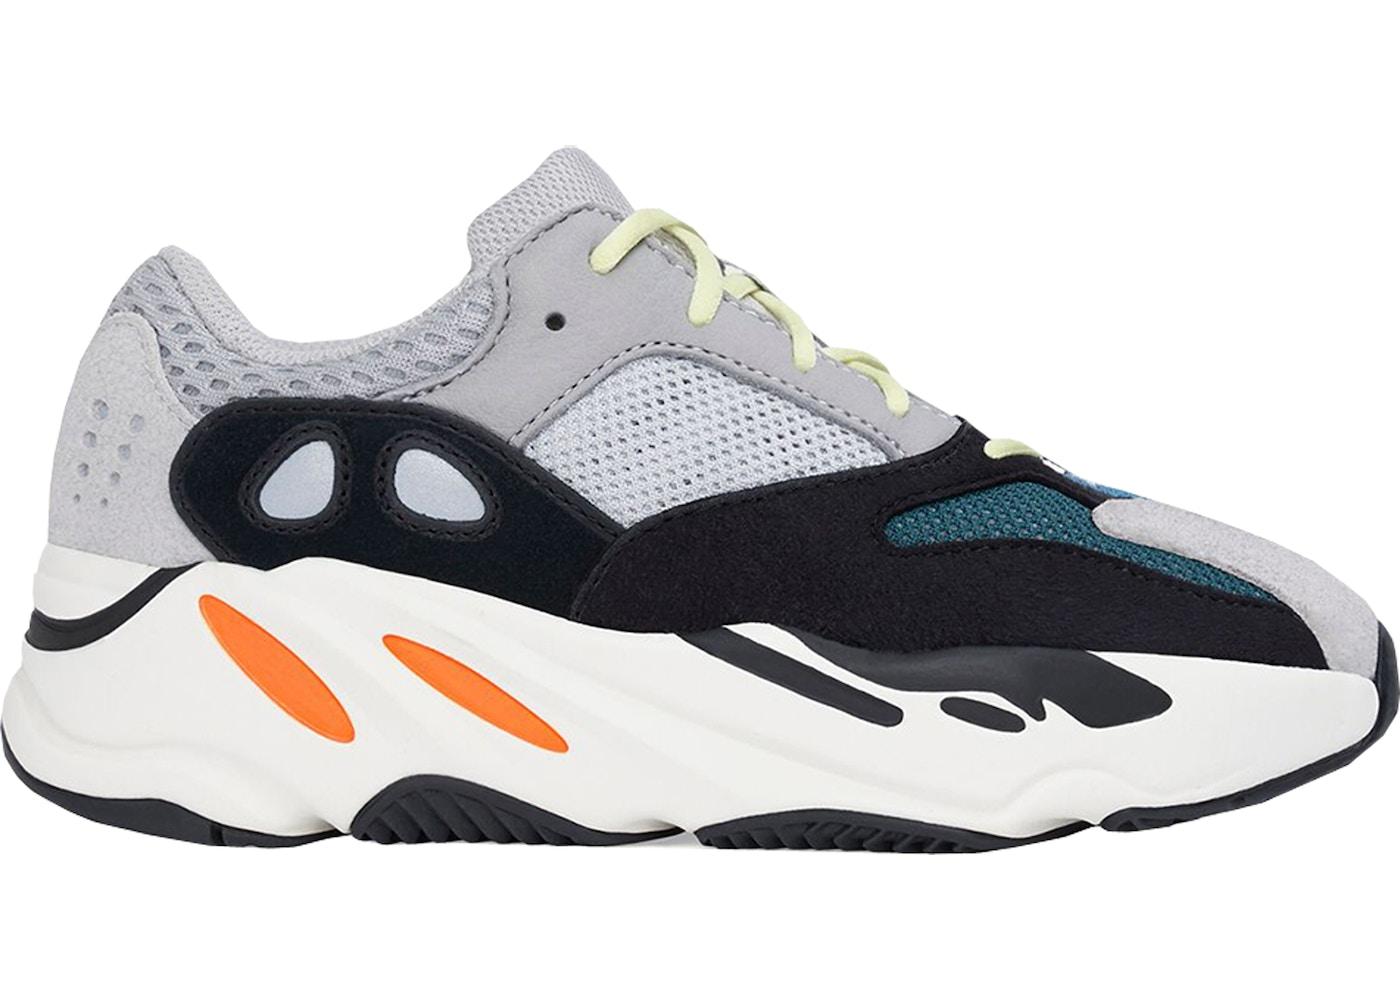 Acheter adidas Yeezy Kids Chaussures et sneakers neuves